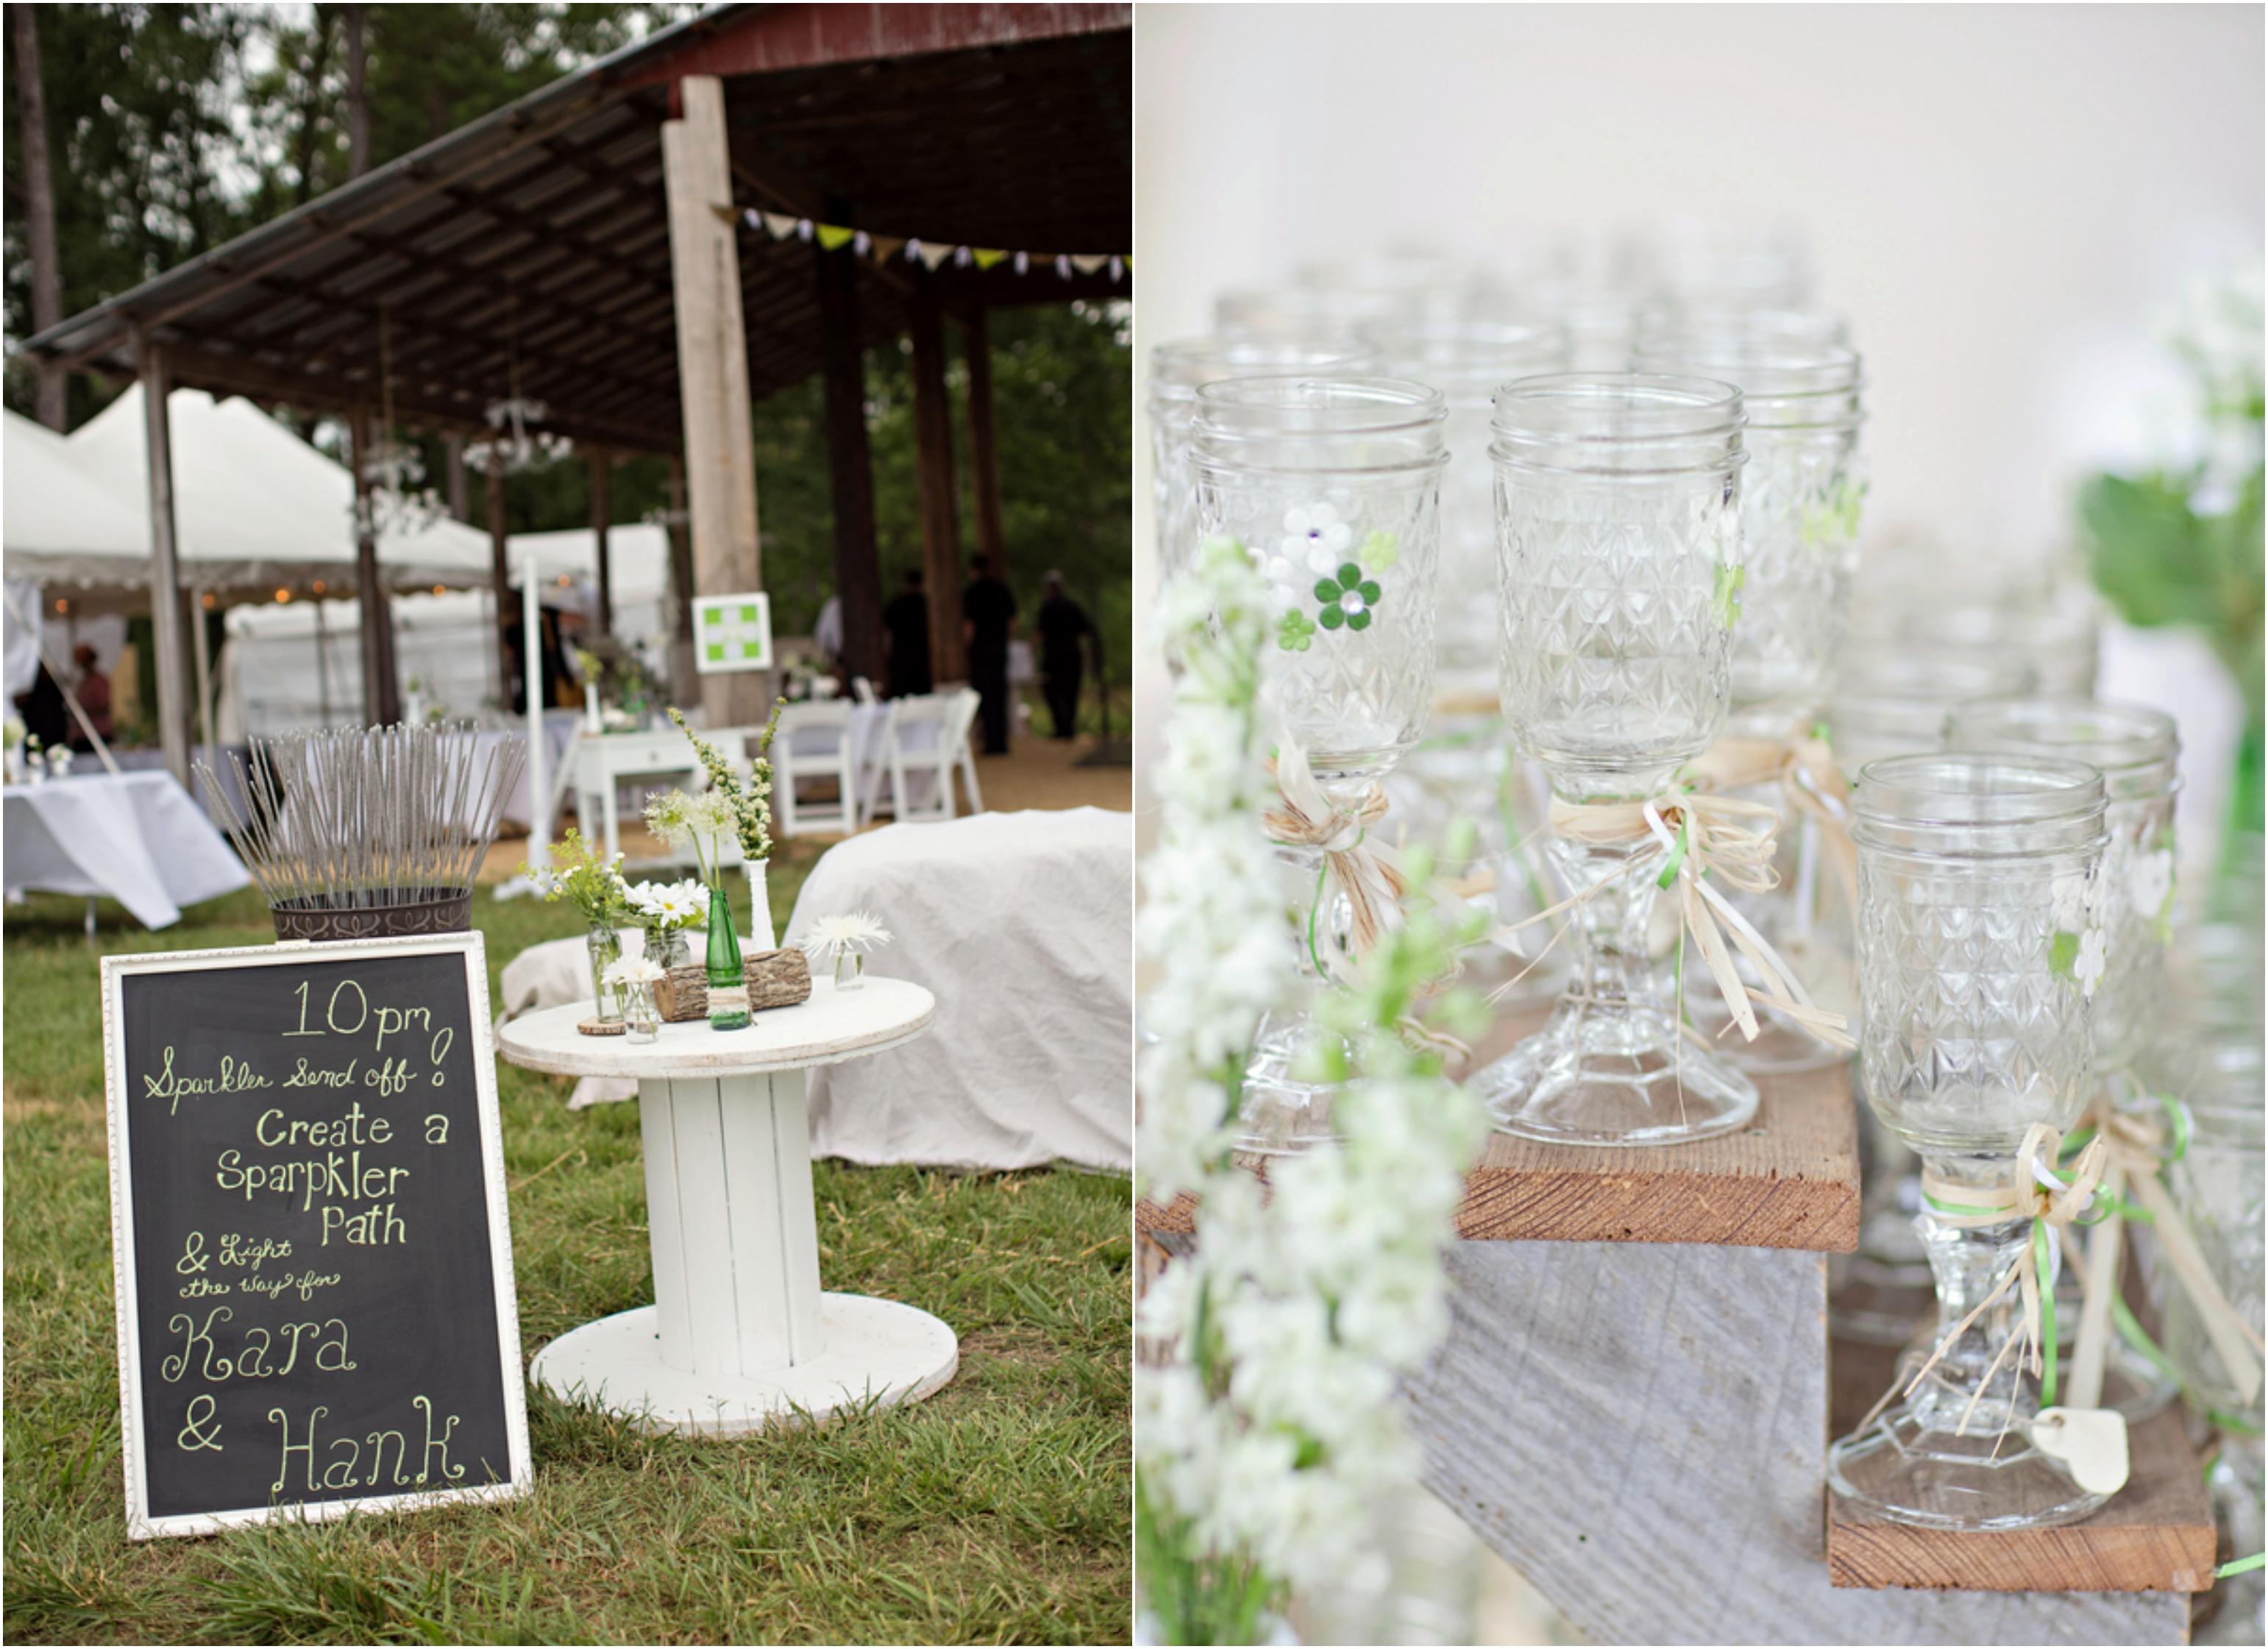 Elegant Country Style Wedding Centerpieces – Wedding